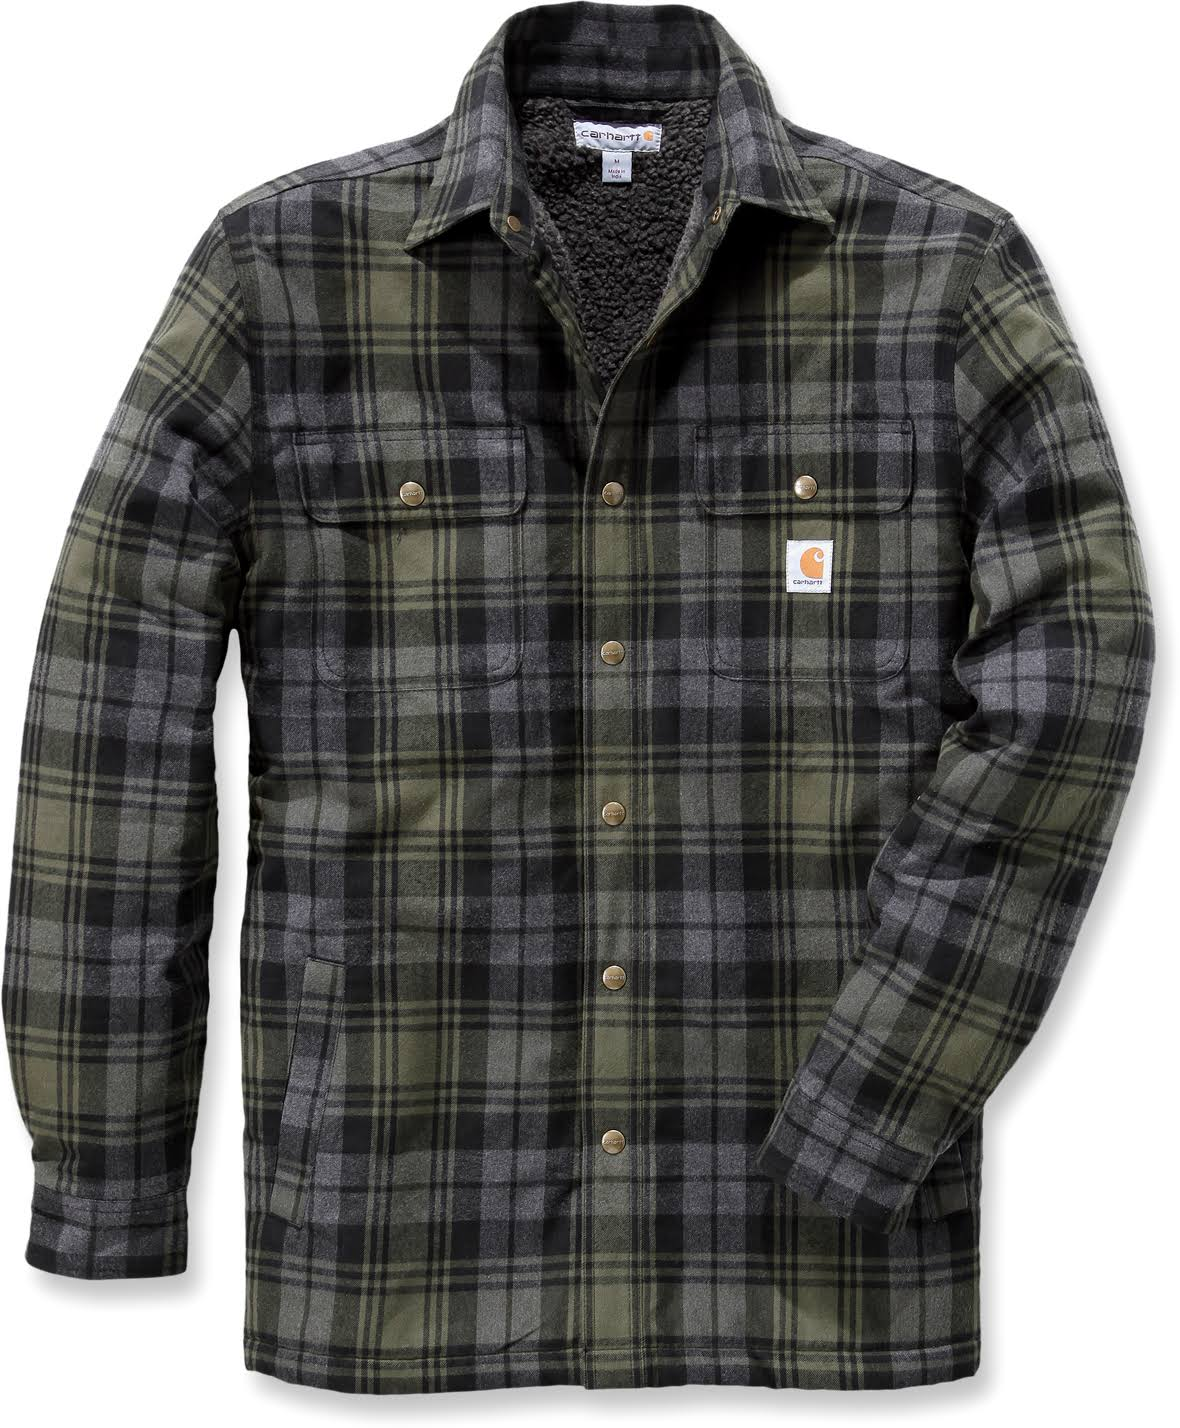 Camisa Musgo Grande Ropa Hubbard De Trabajo Carhartt X Sherpa Forrada n0fCqgBwx